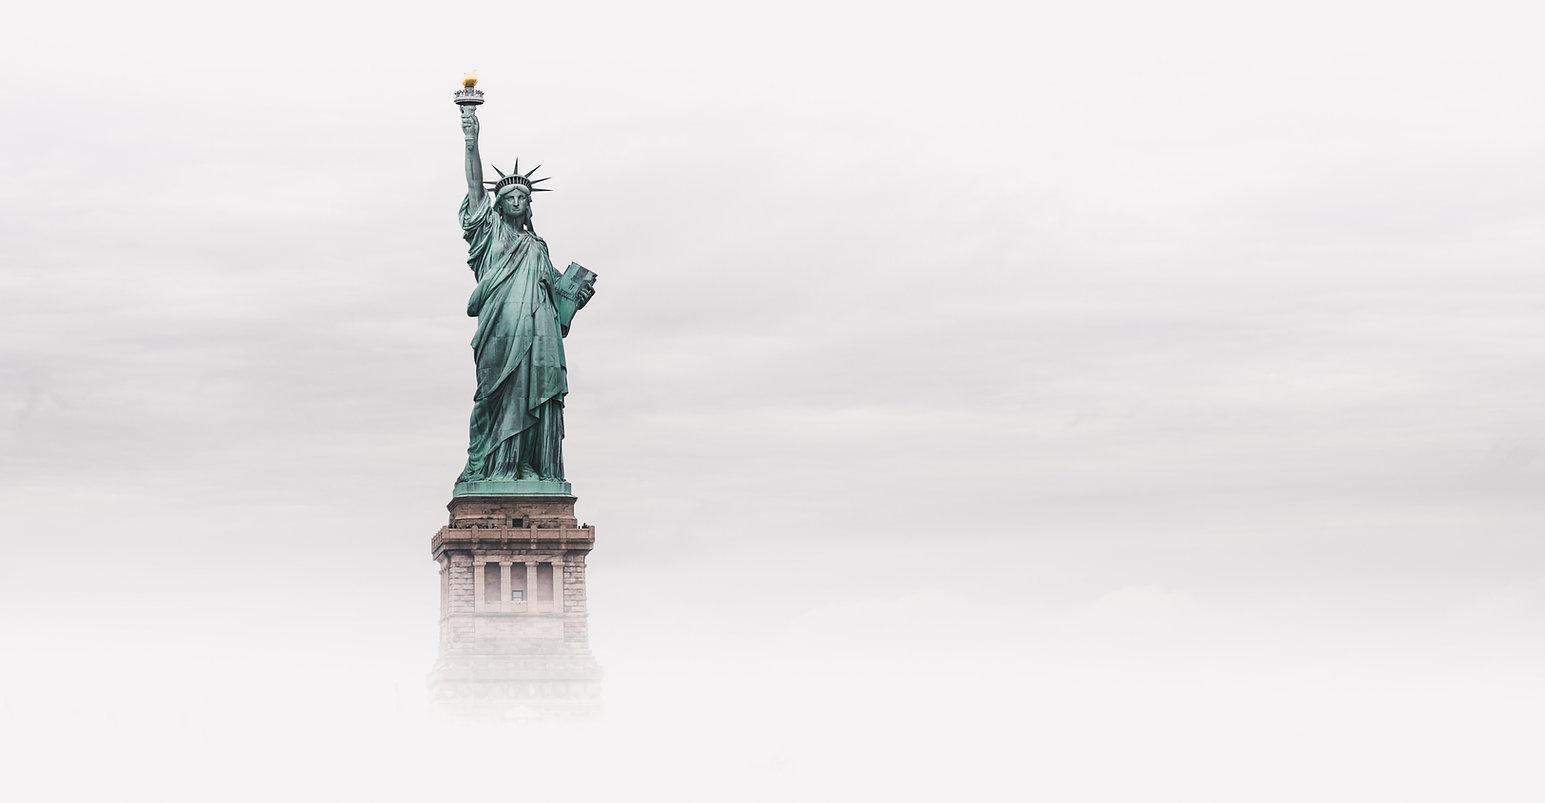 Statuja-Svobody-free-1.jpg